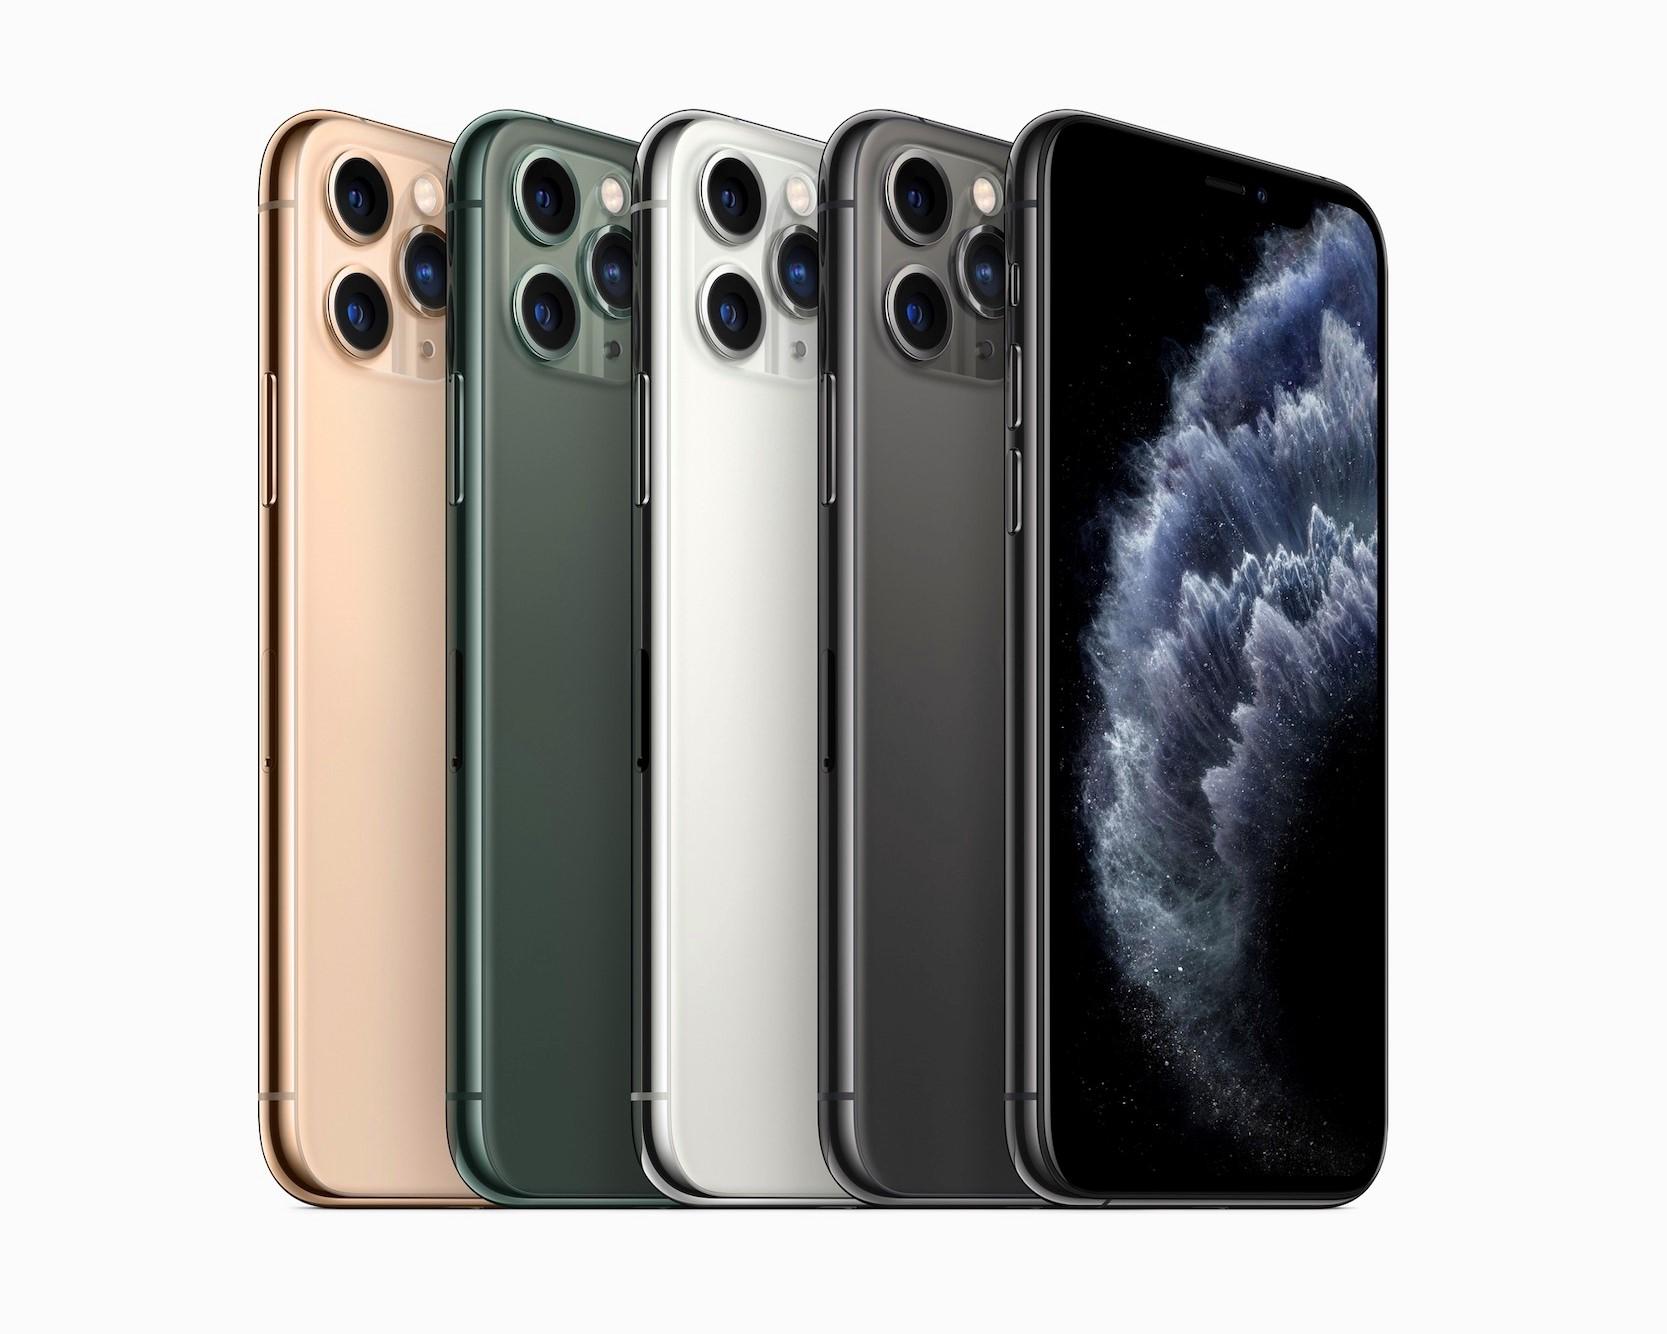 256 GB 版 iPhone 11 Pro 在美国最受欢迎